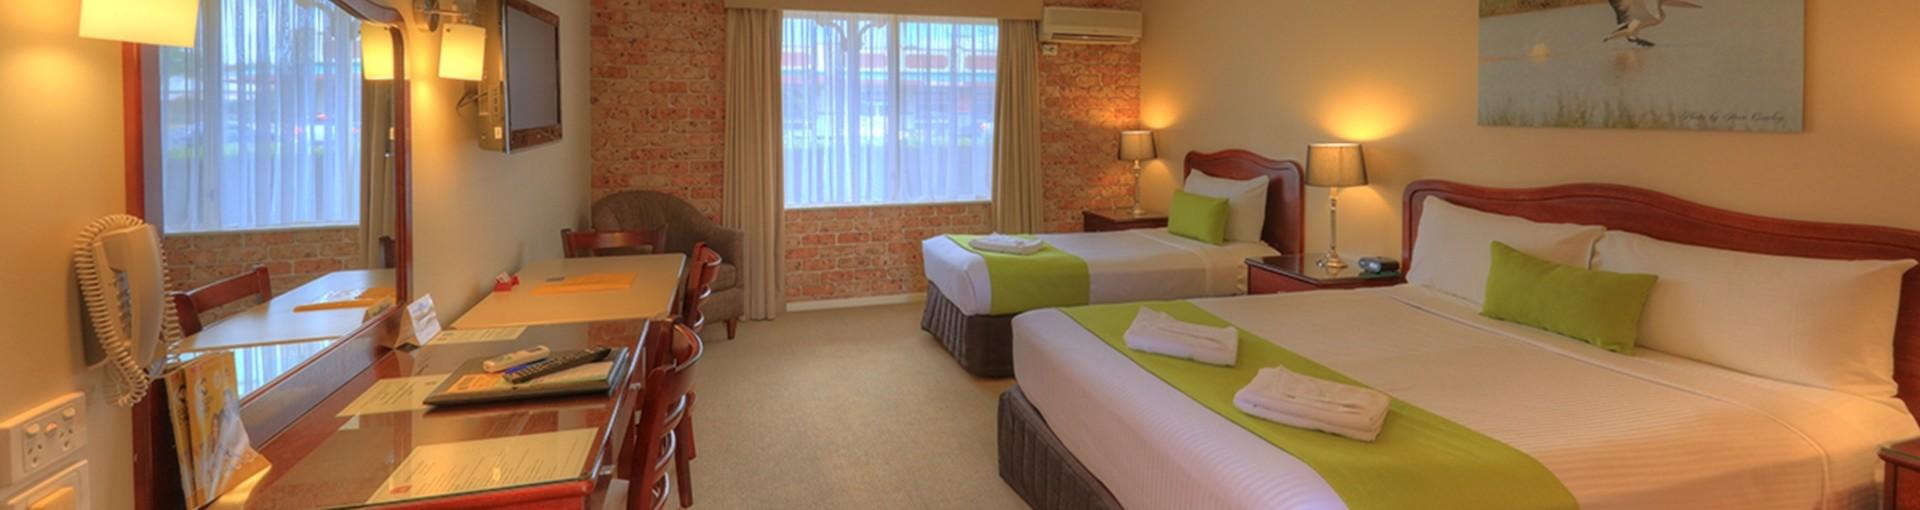 Queen Twin Room - Endeavour Court Motor Inn Dubbo NSW